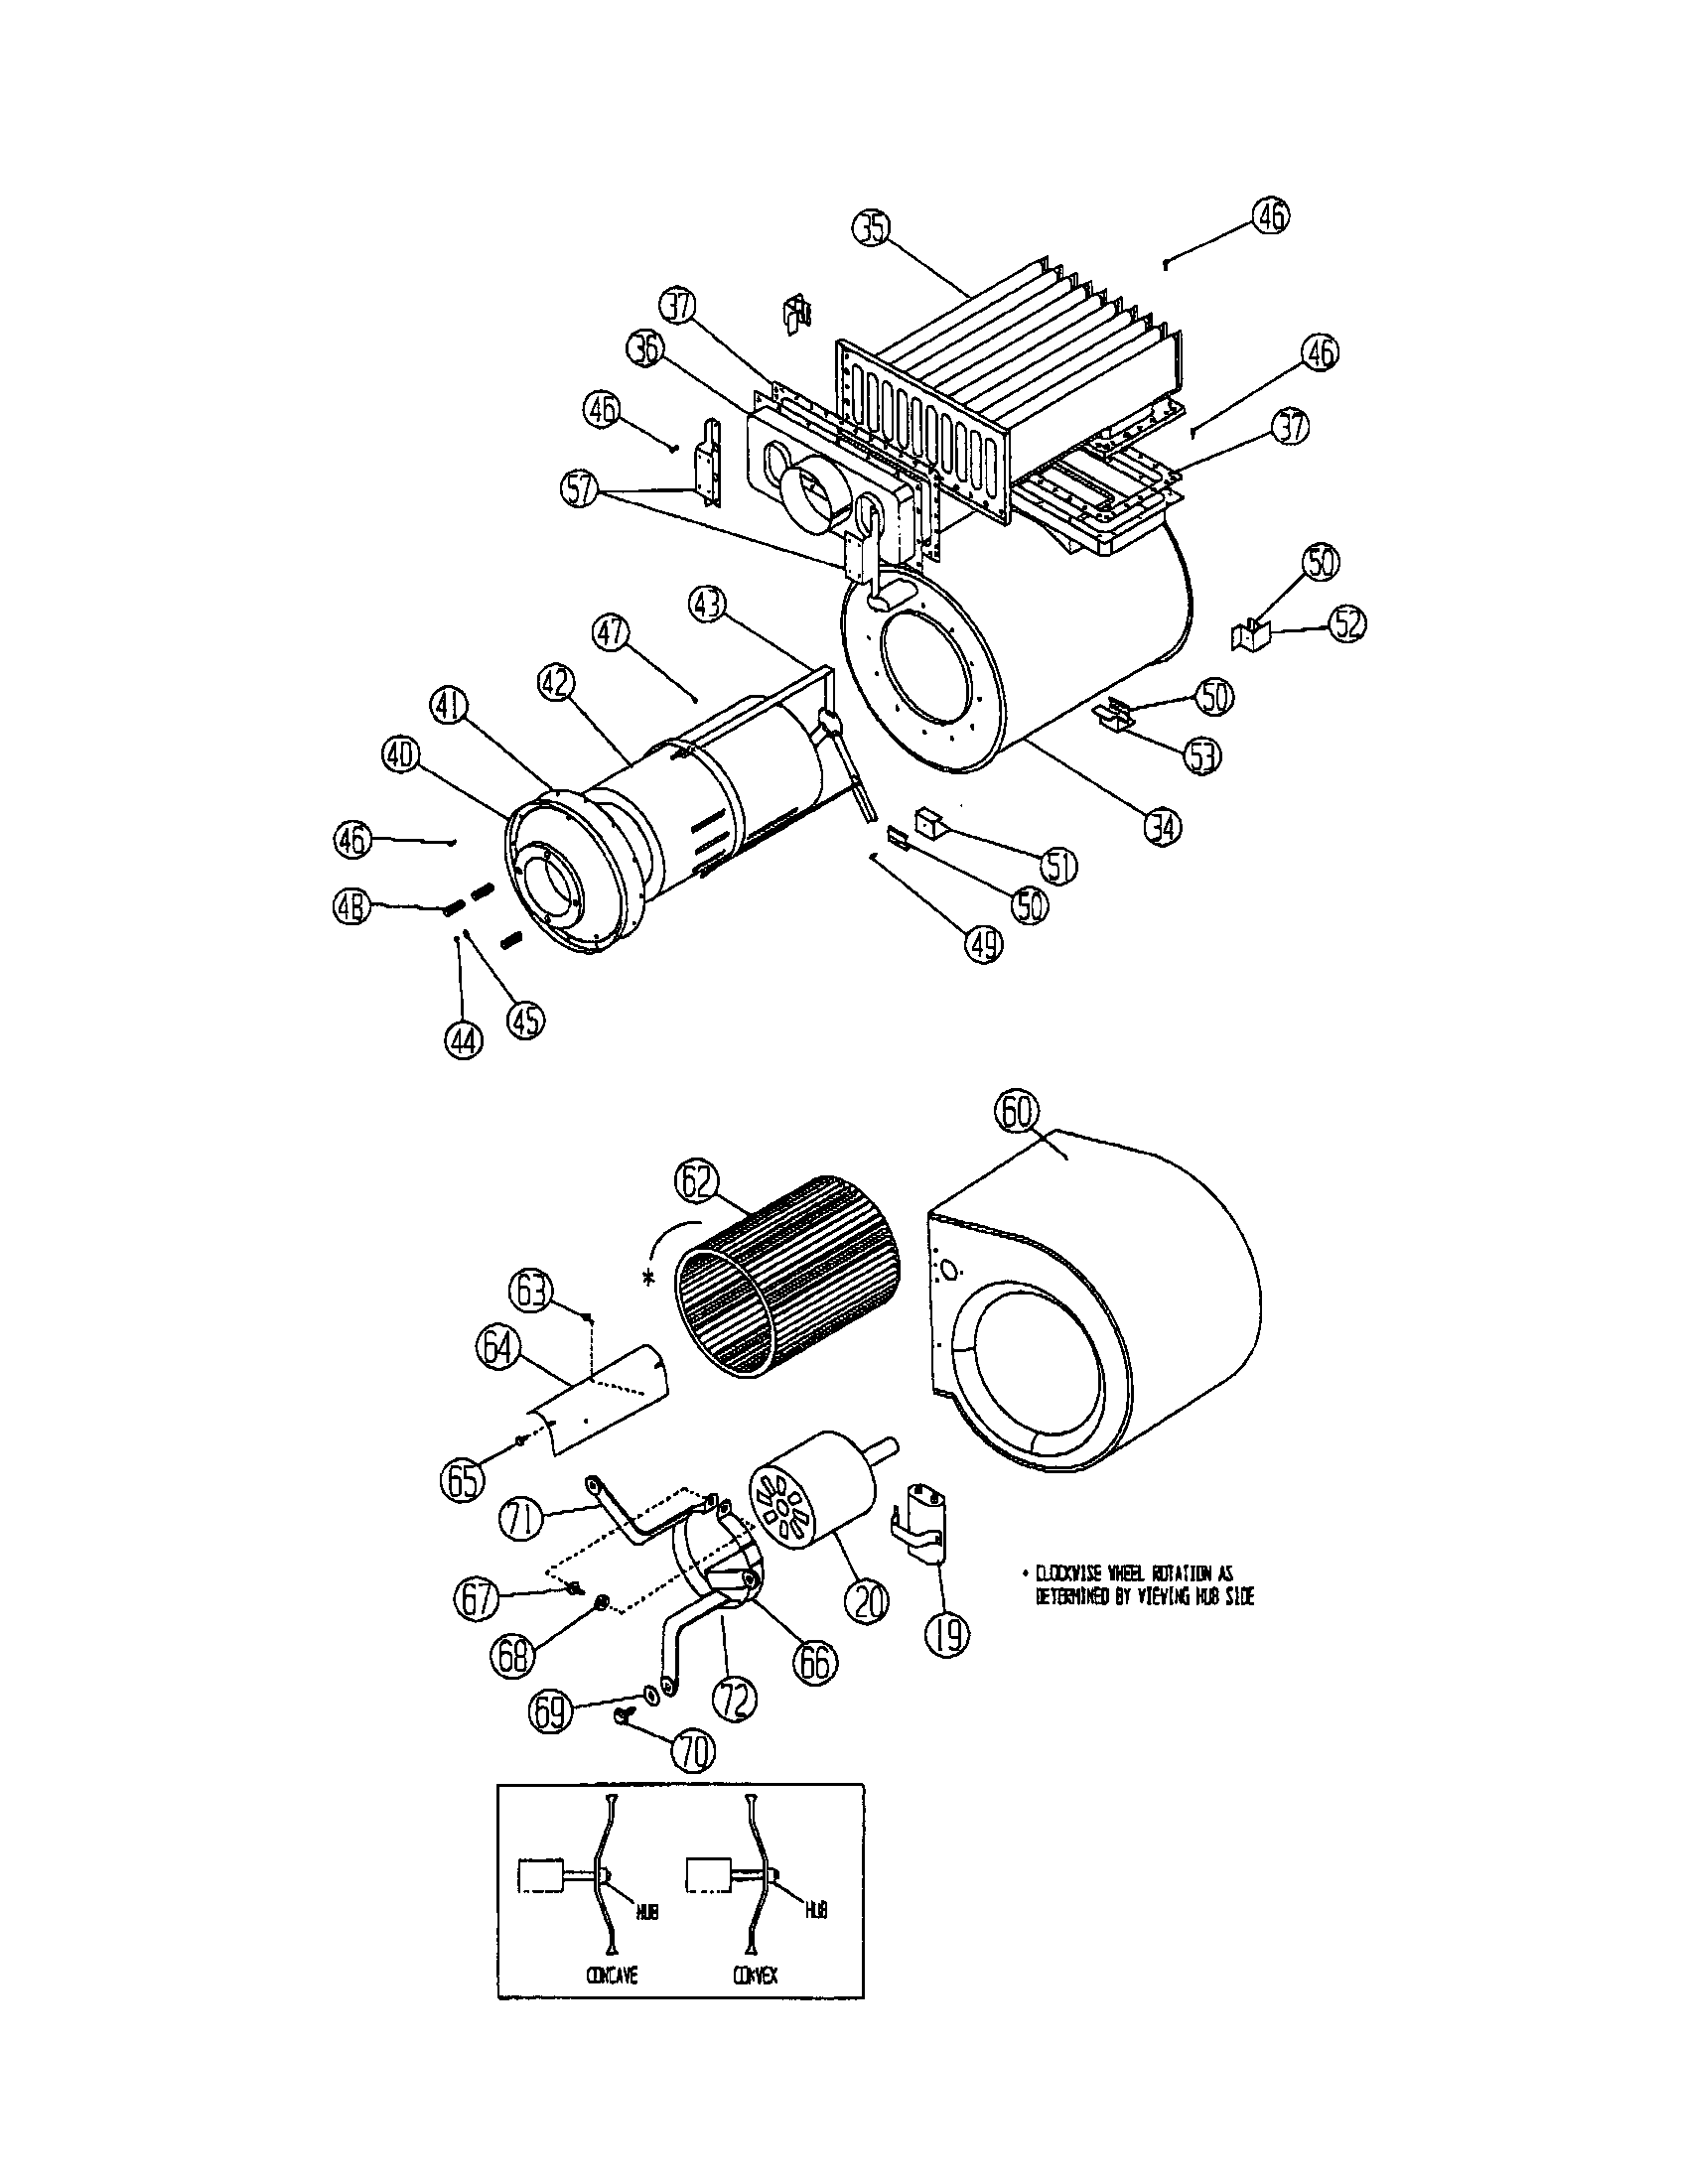 Furnace: Ducane Furnace Parts